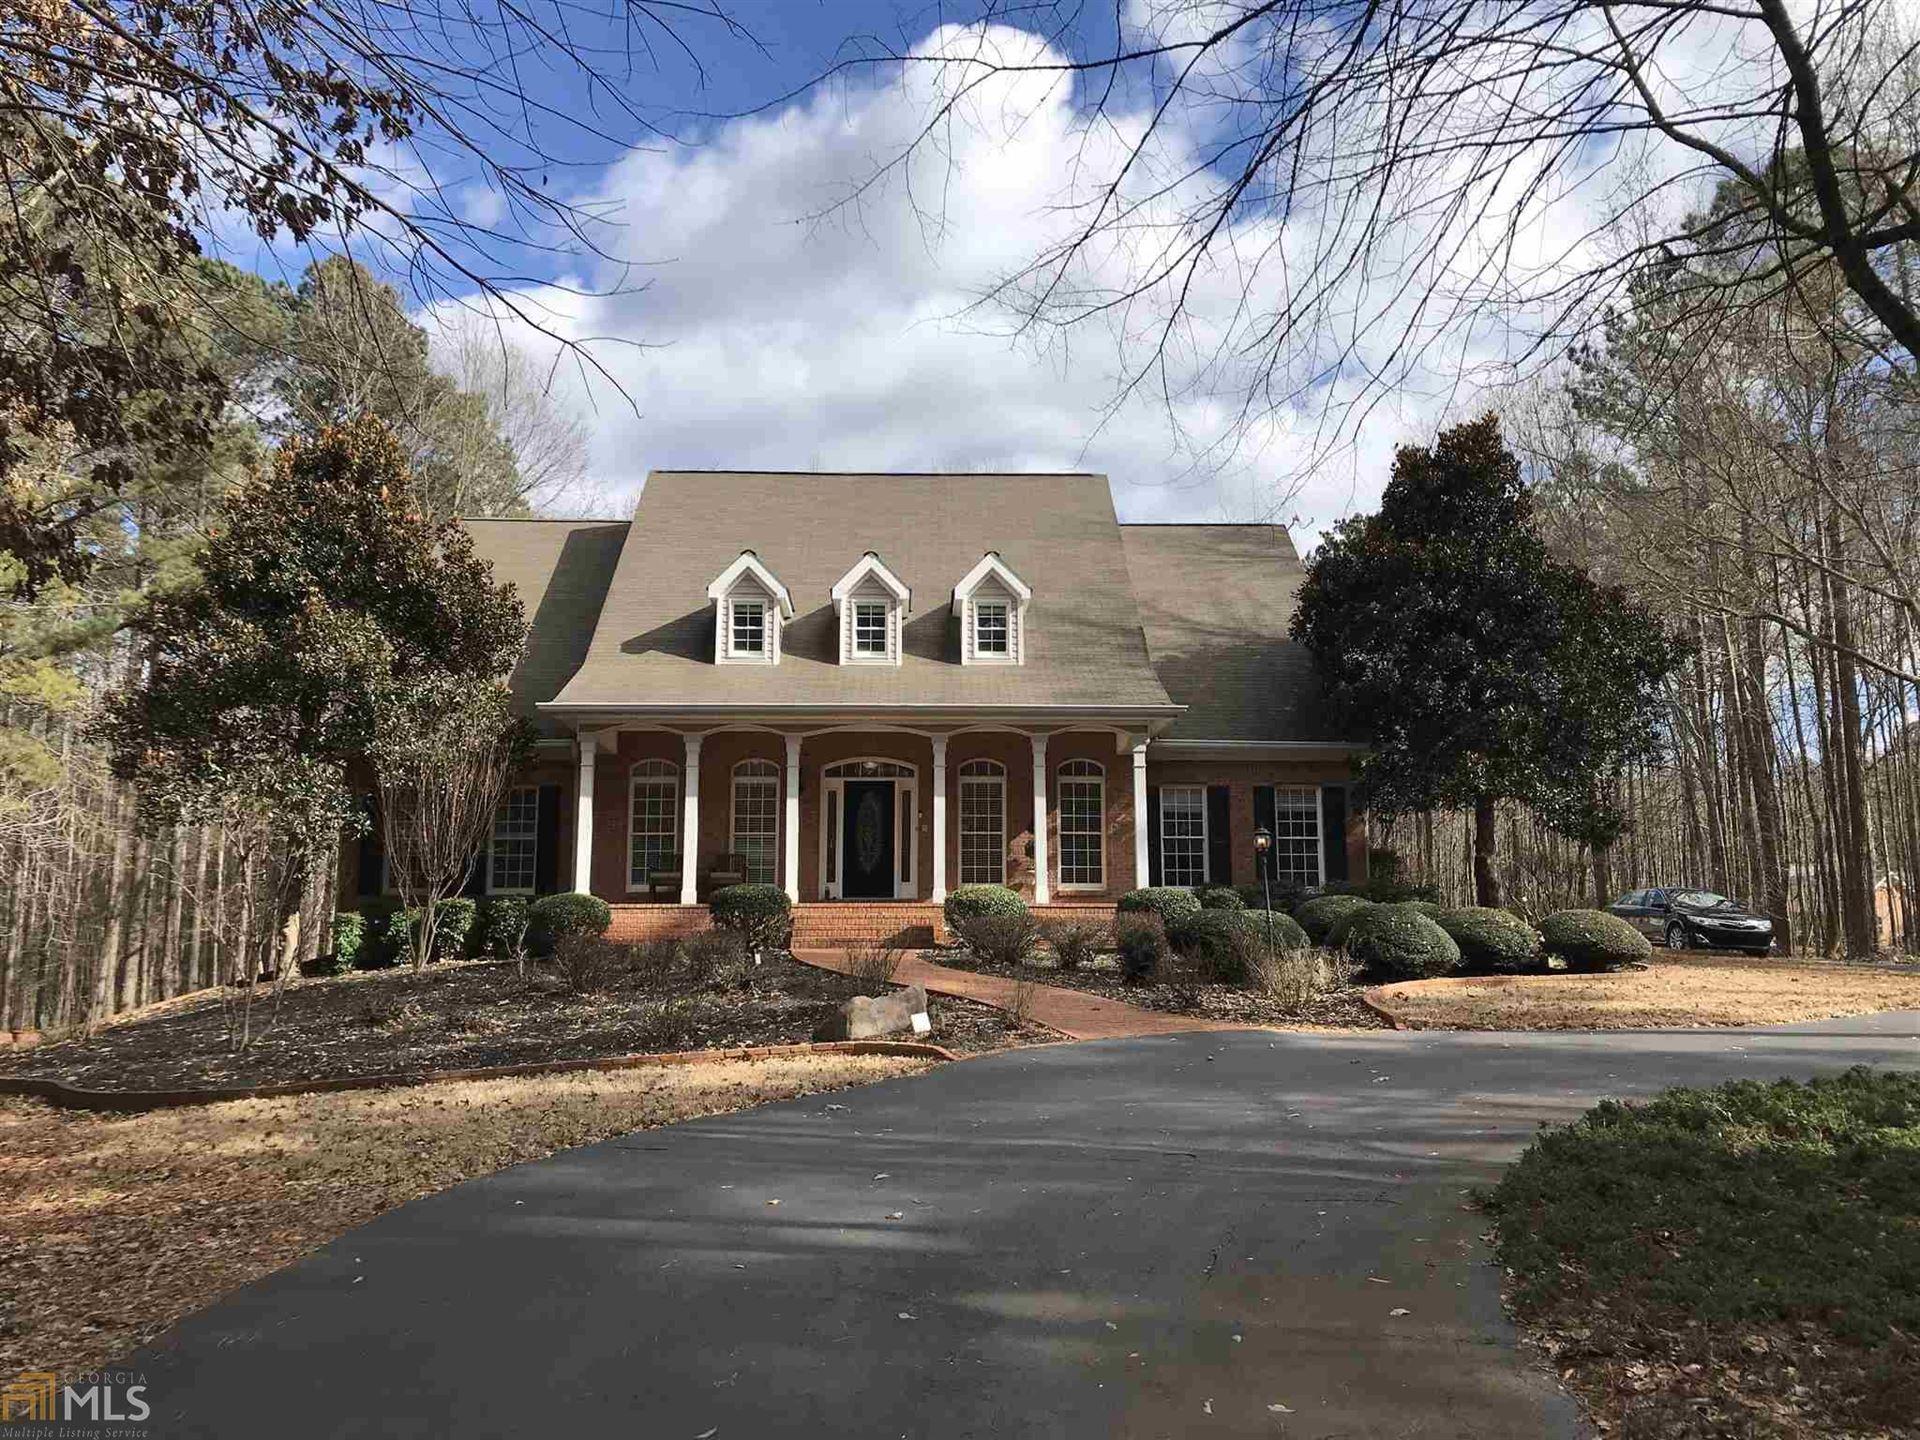 718 Old Greenville Rd, Fayetteville, GA 30215 - #: 8907291